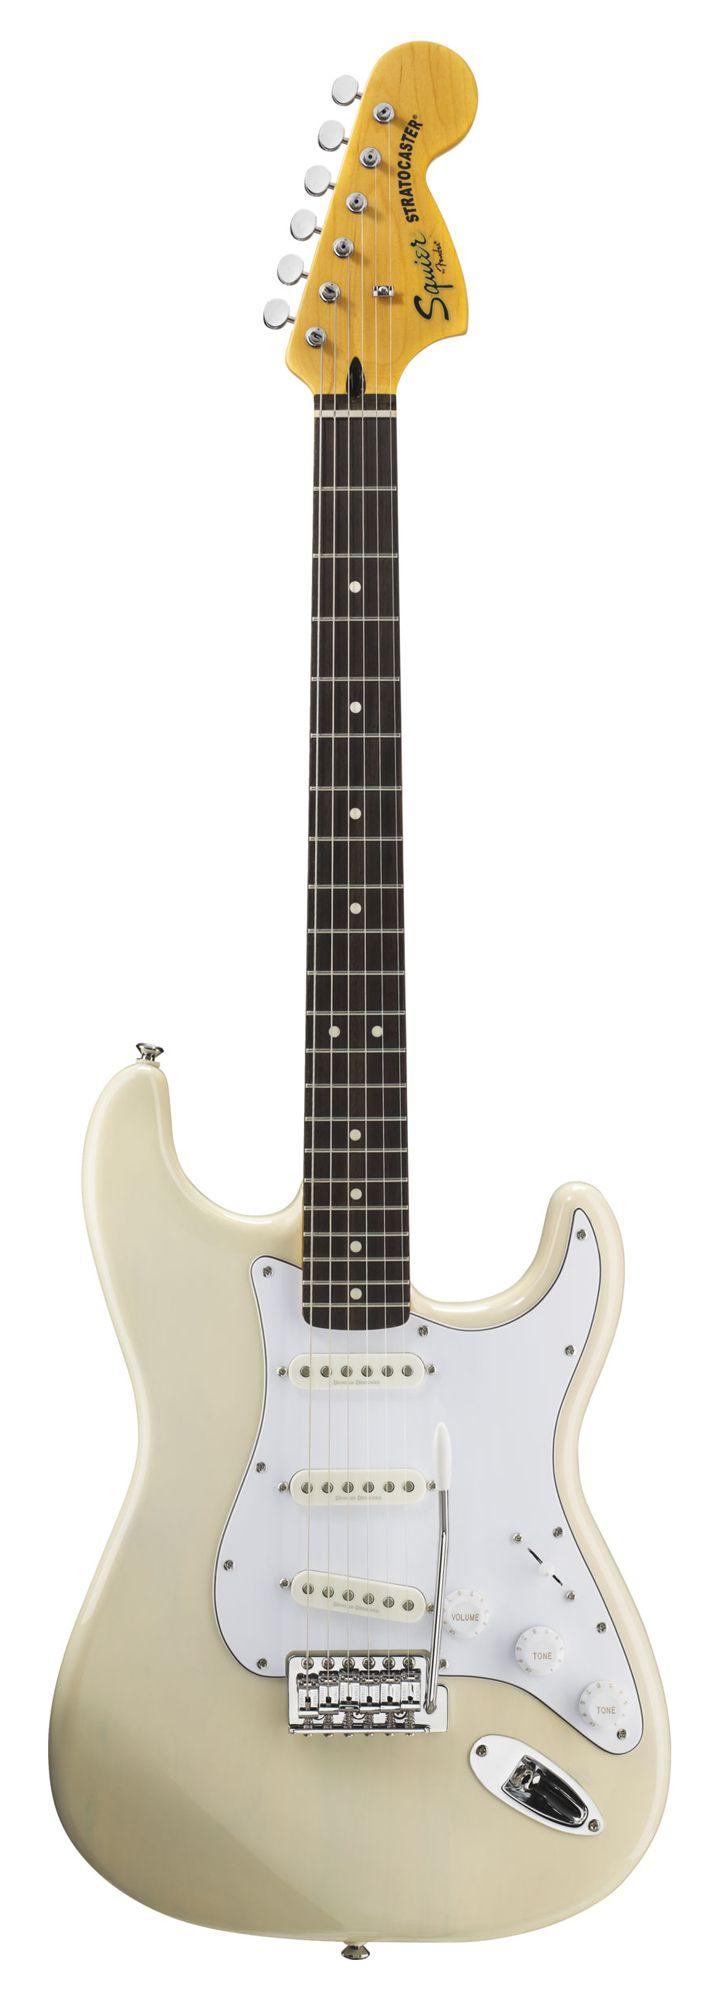 Squier Vintage Modified Stratocaster - Vintage Blonde